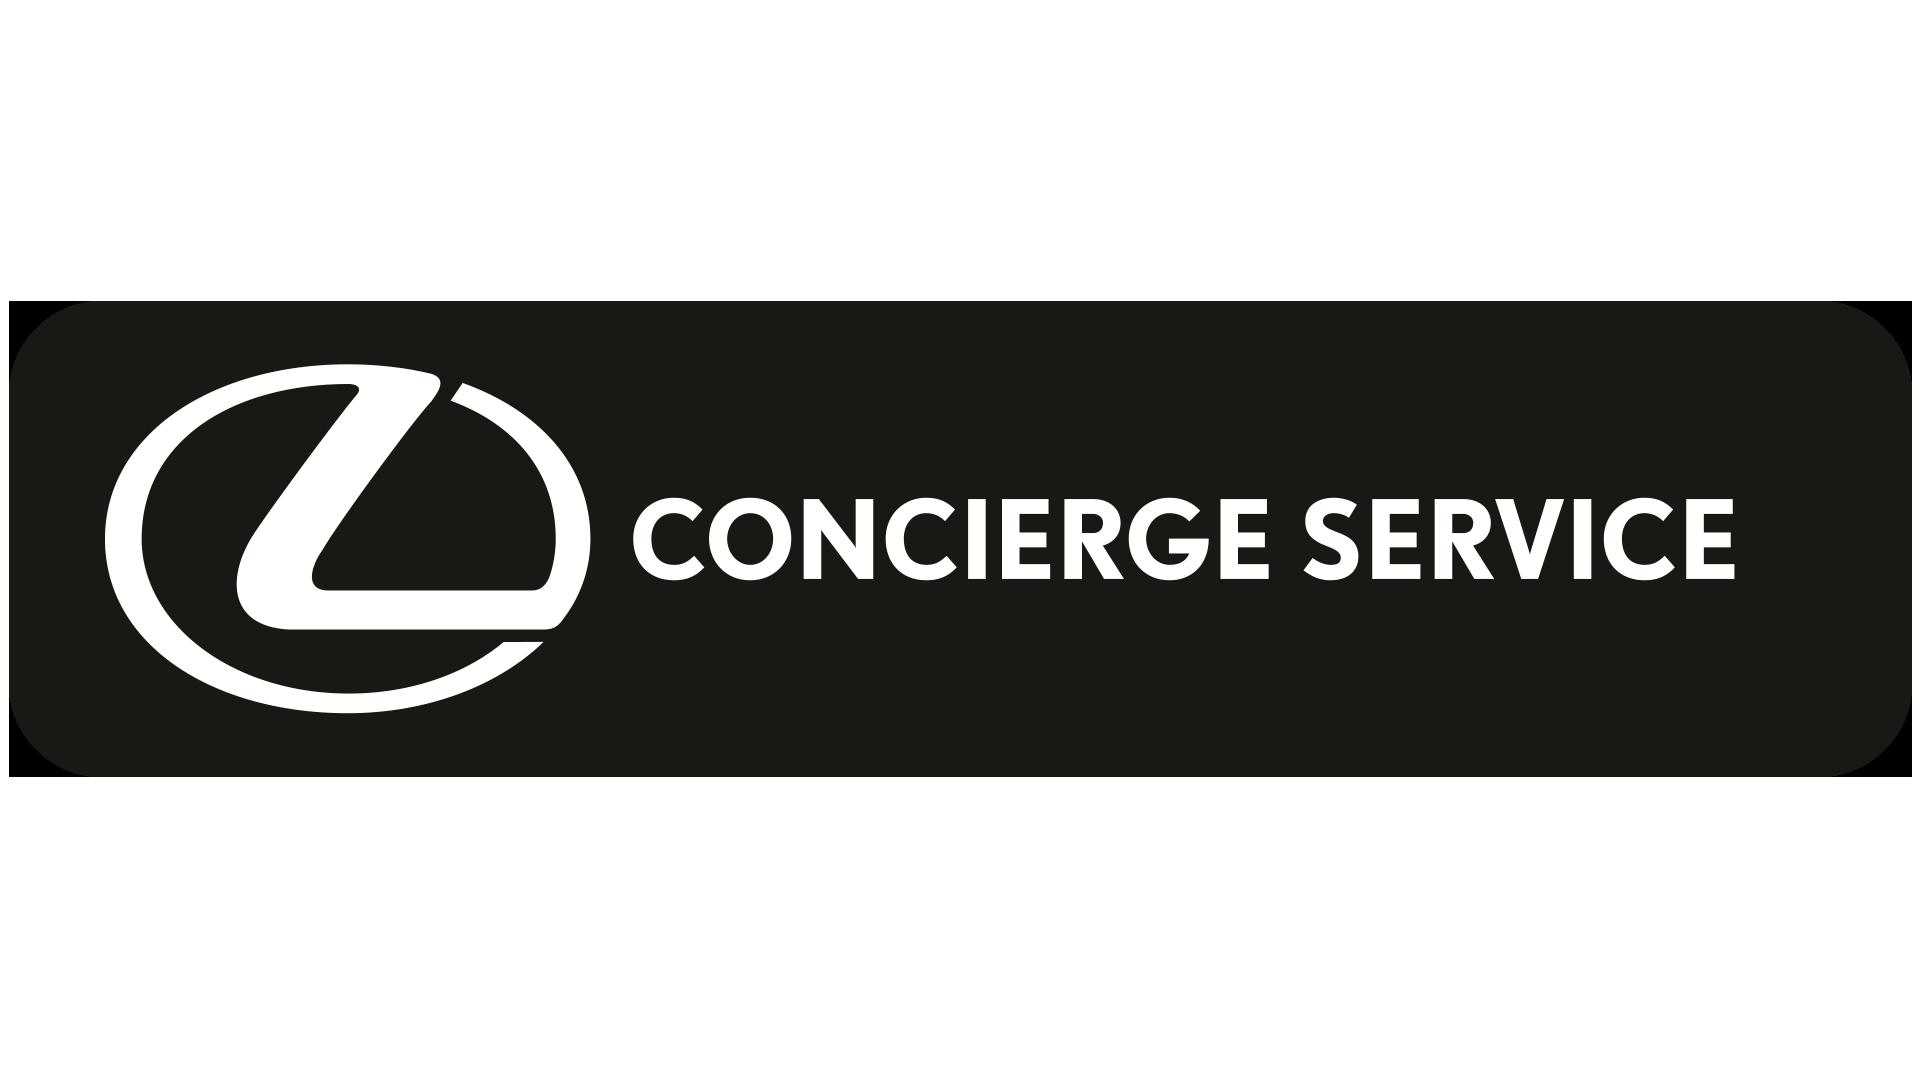 Lexus concierge service logo image